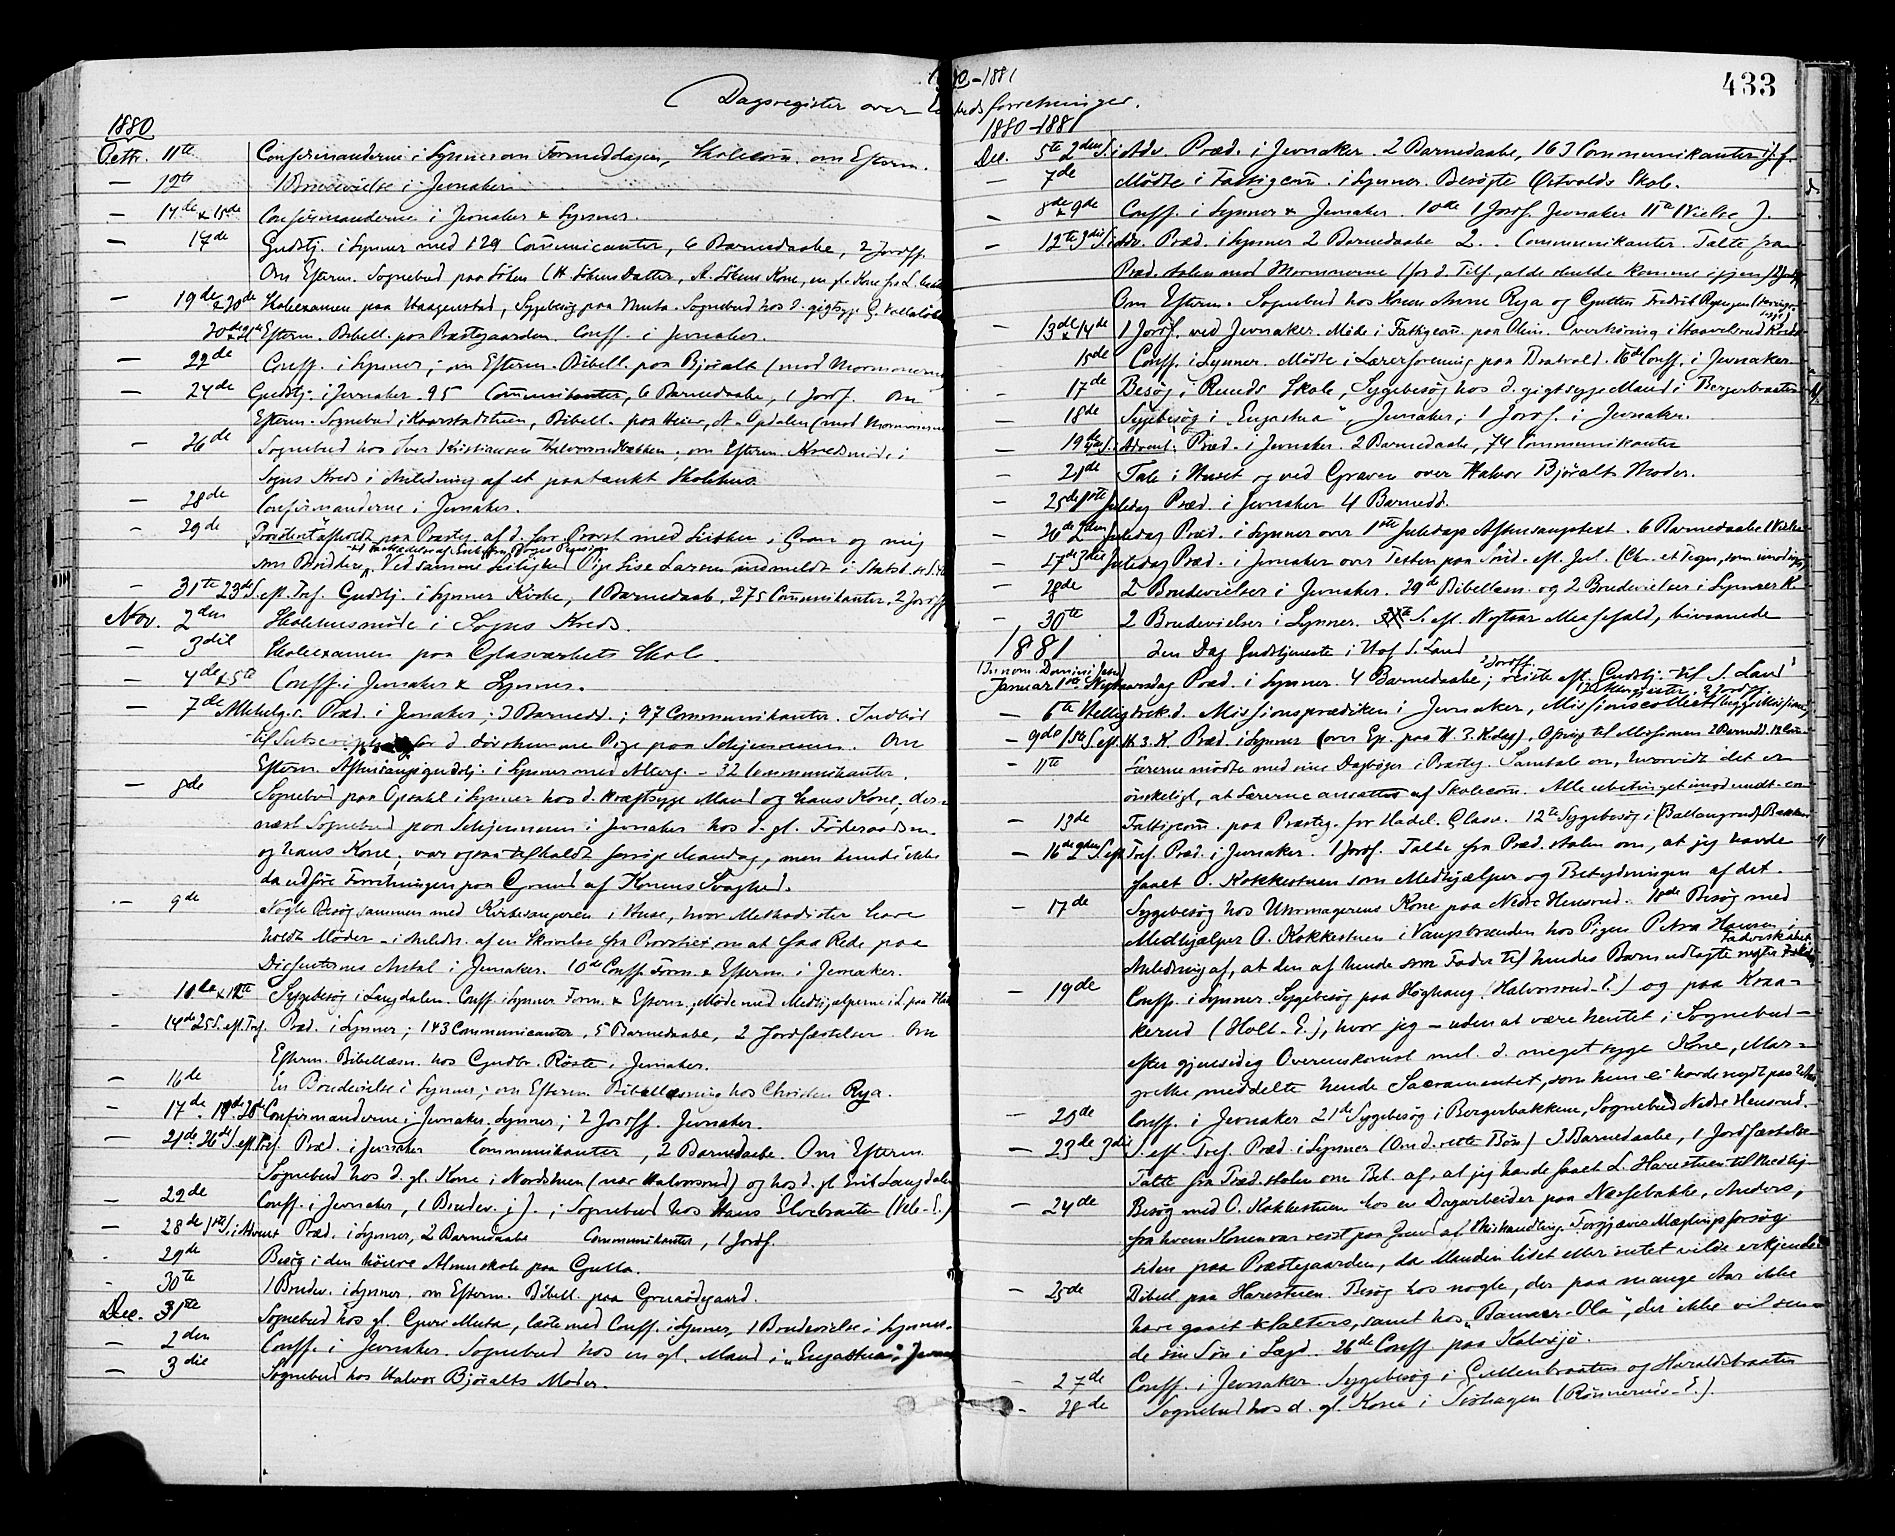 SAH, Jevnaker prestekontor, Ministerialbok nr. 8, 1877-1890, s. 433